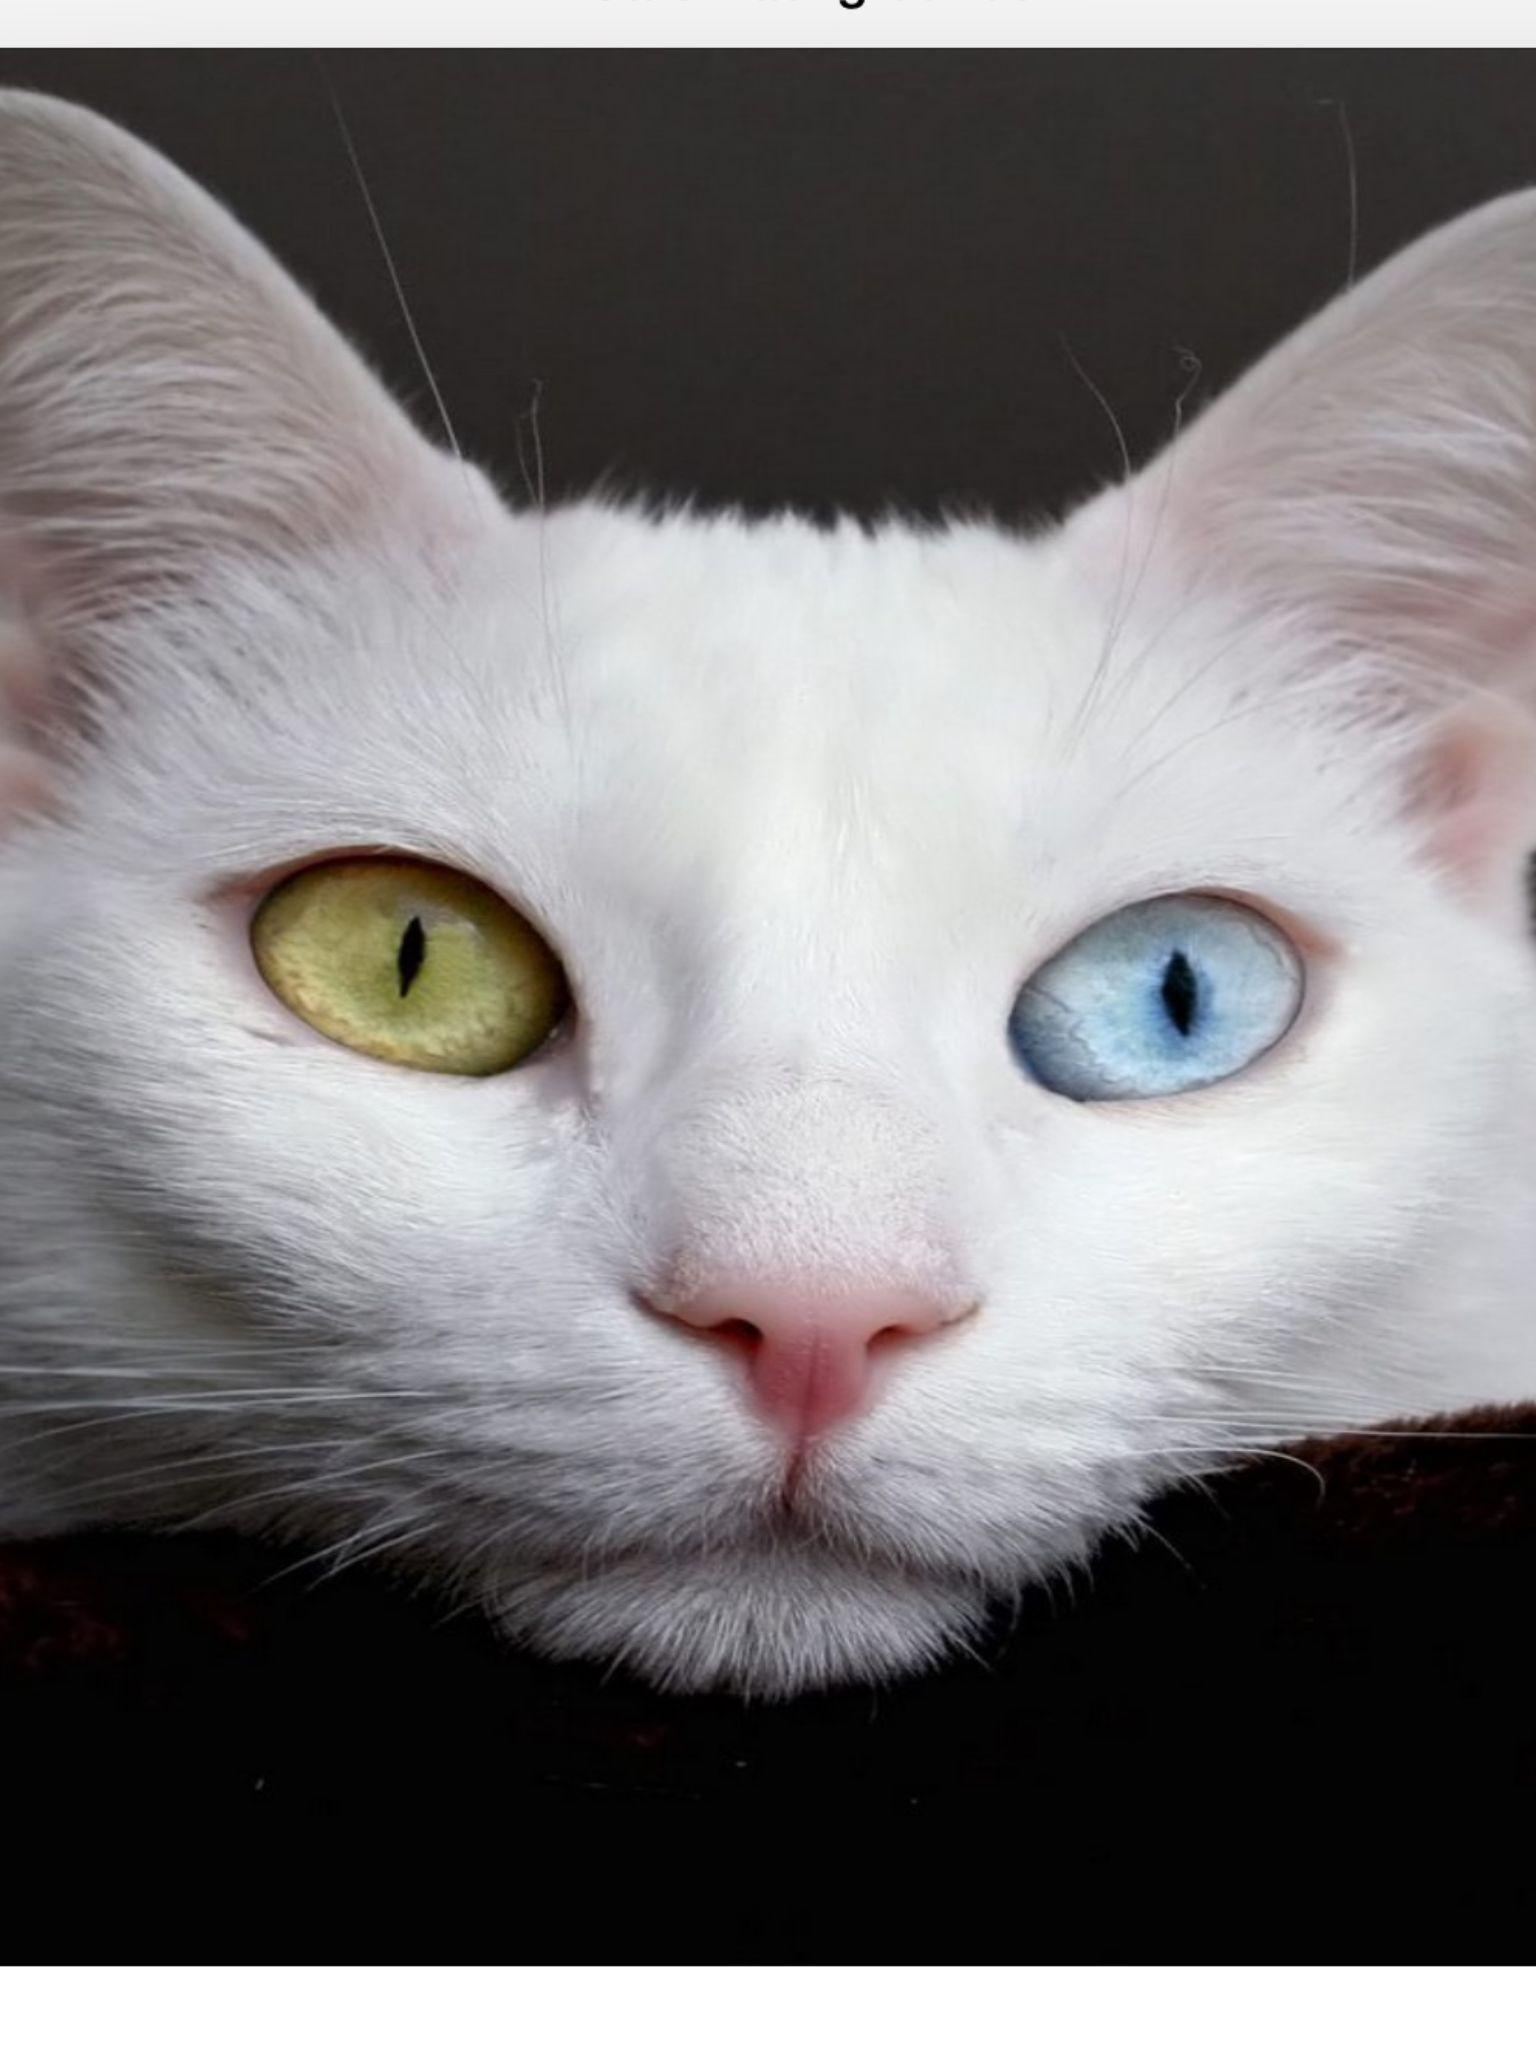 Wow! That cat has beautiful eyes!( Angora cats, Turkish